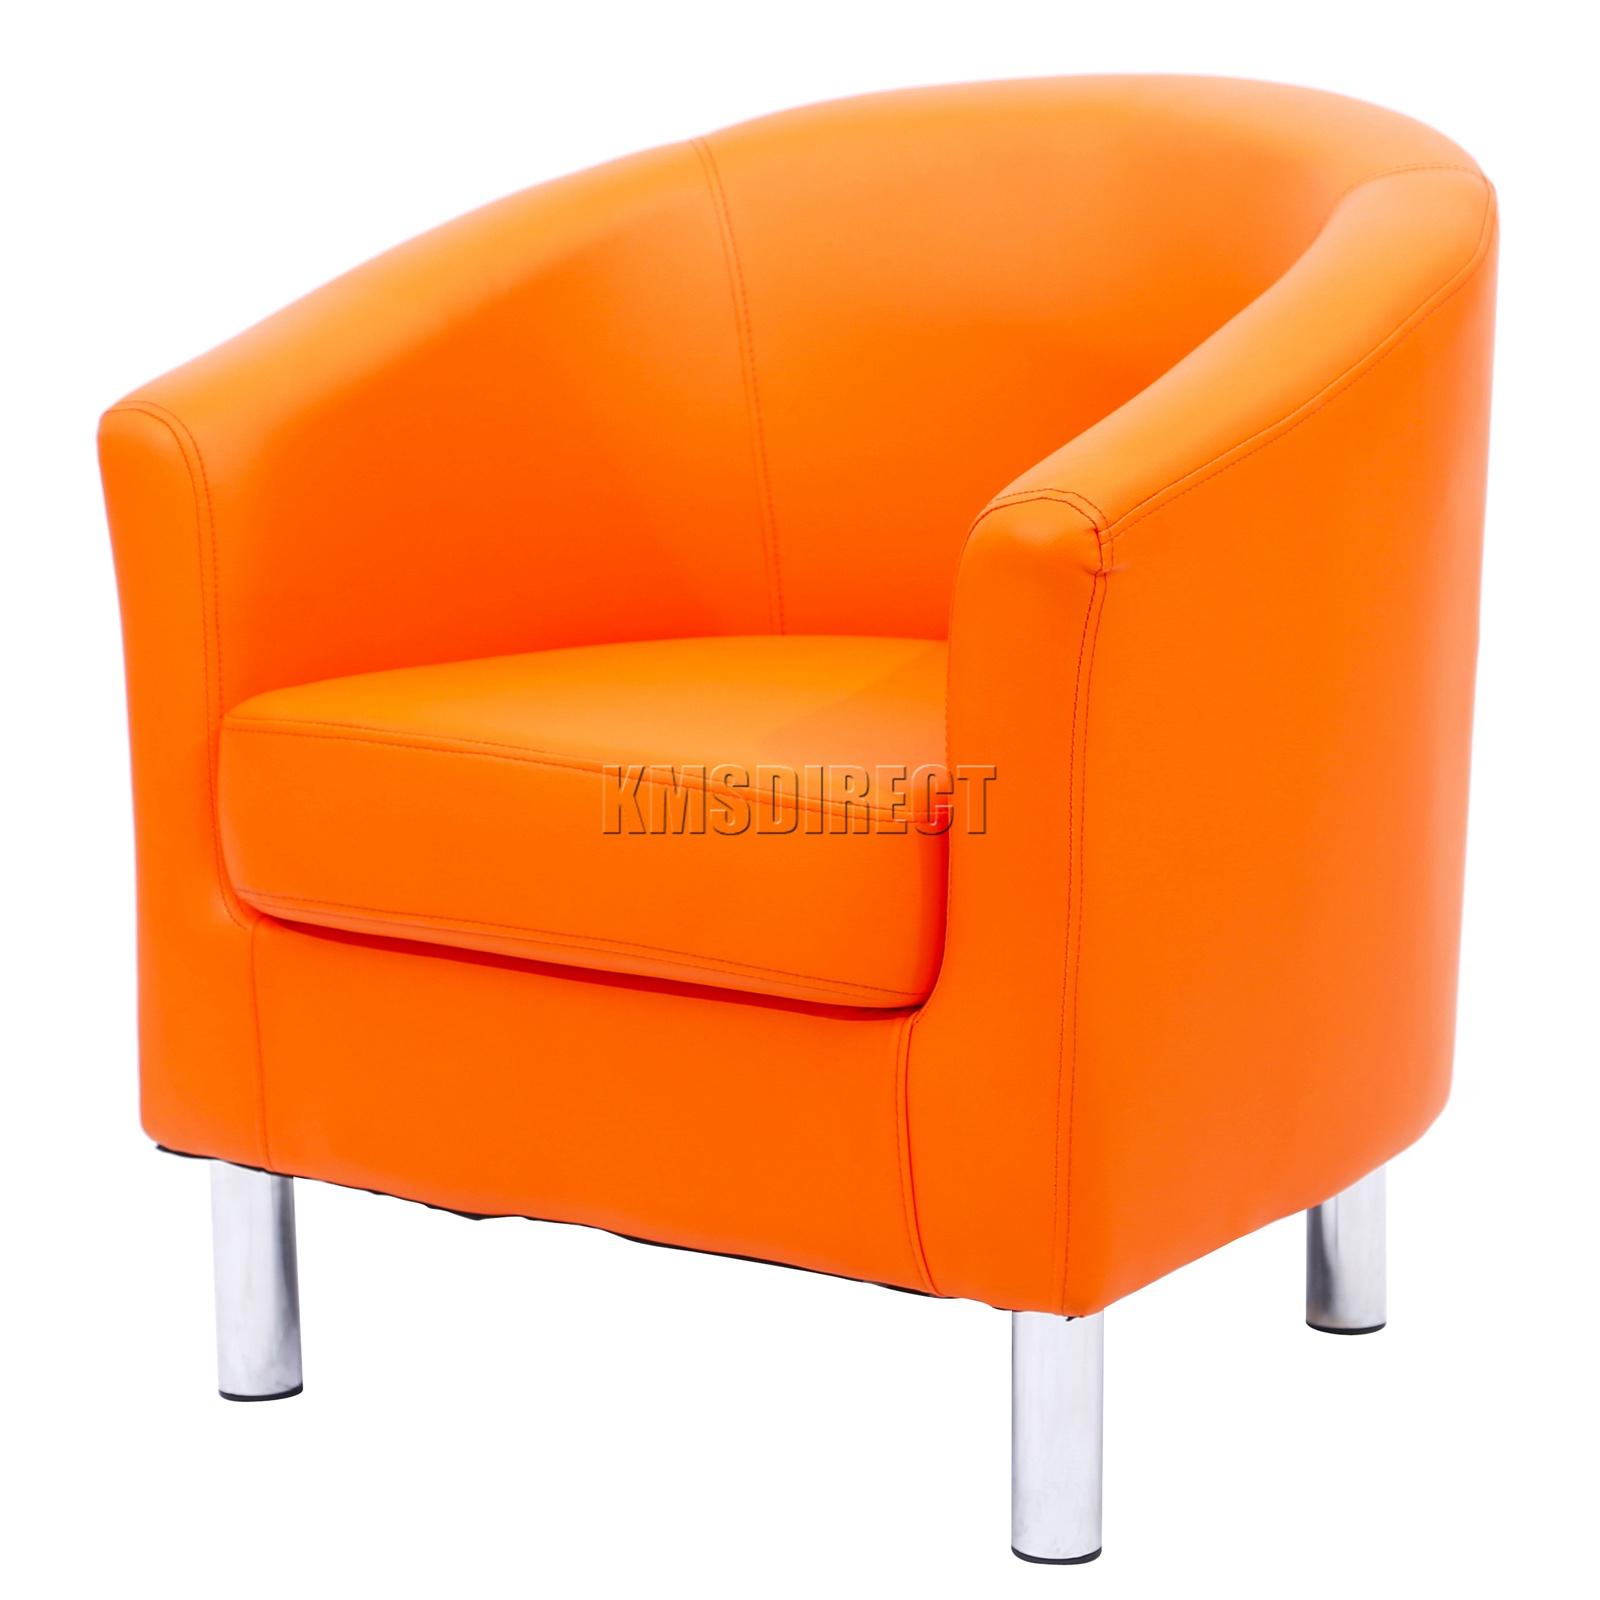 WestWood Modern Tub Chair Armchair PU Faux Leather